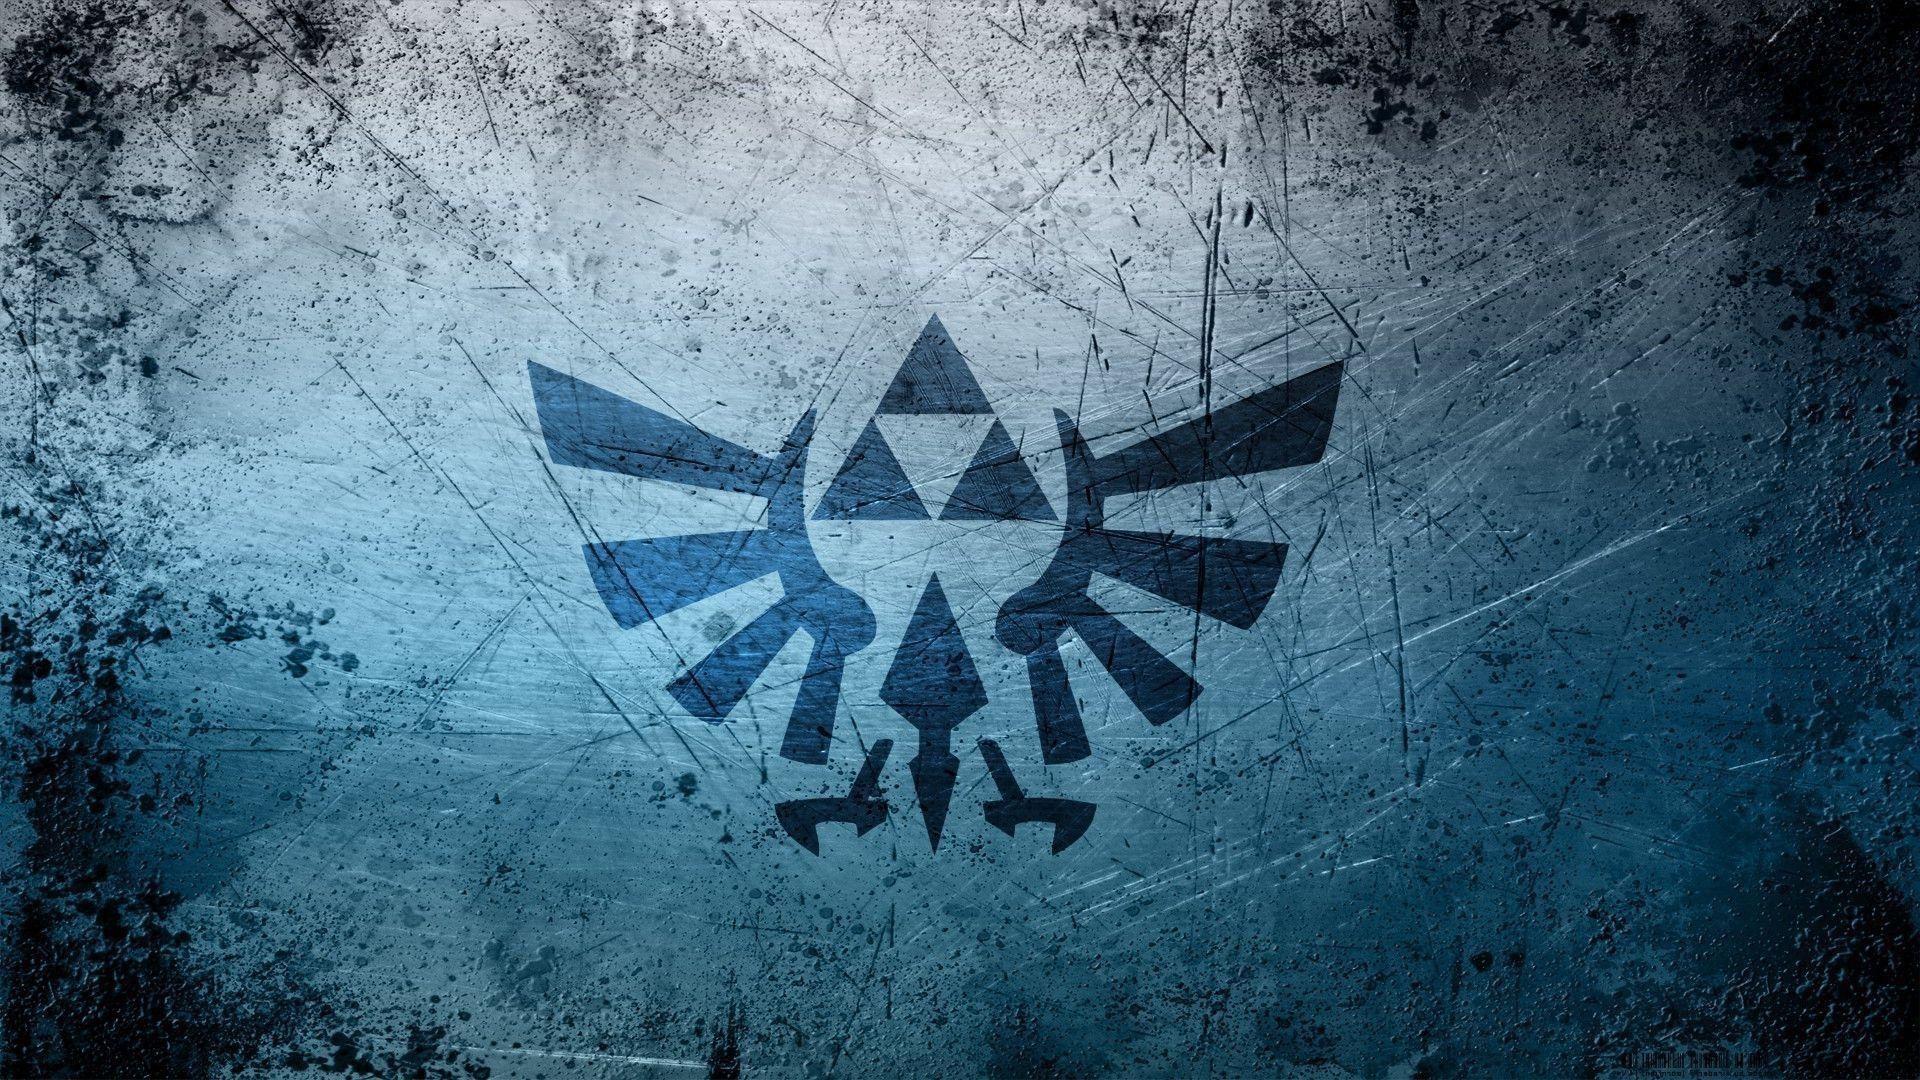 10 Latest Legend Of Zelda Backgrounds Full Hd 1080p For Pc Background Gaming Wallpapers Zelda Hd Legend Of Zelda